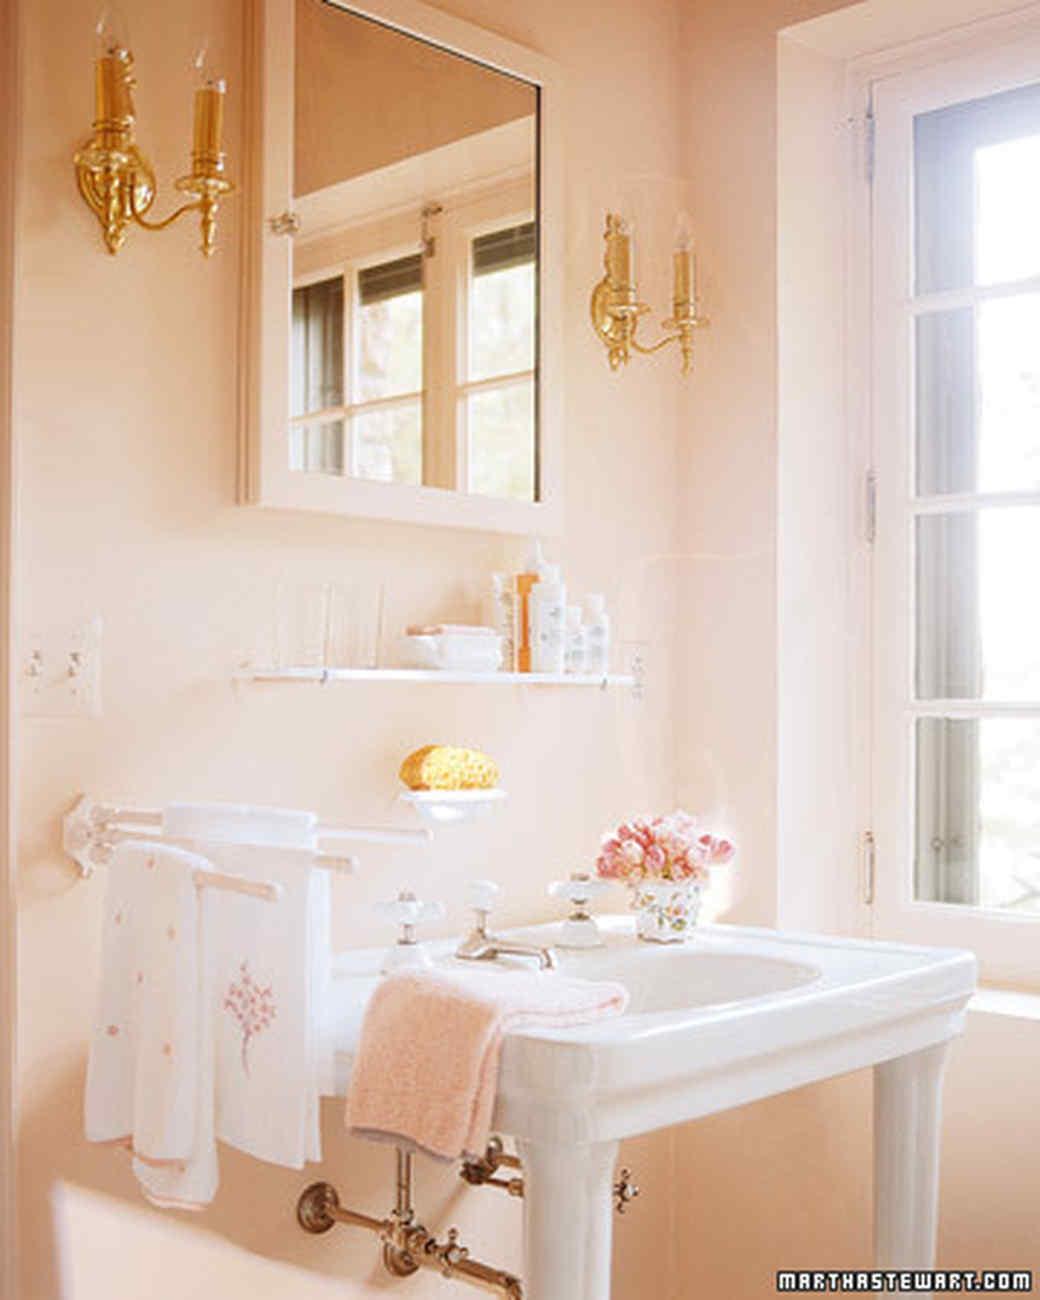 Bright Pink Paint Samples Kitchen Towels: Martha Stewart